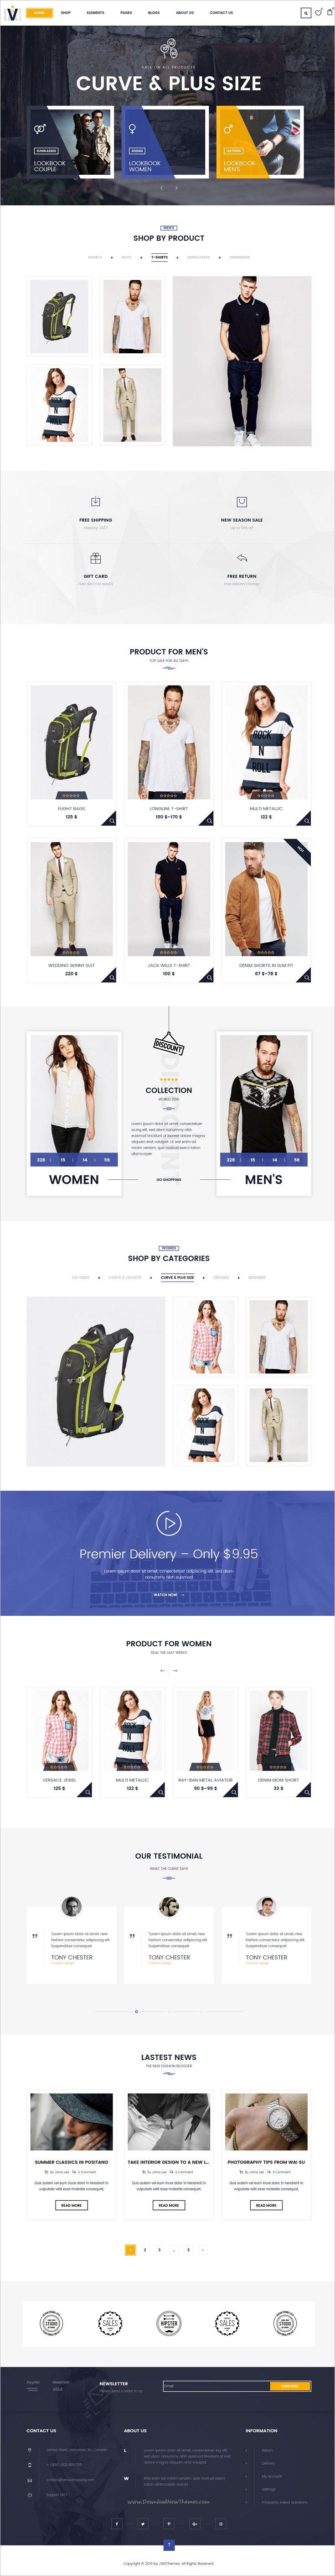 Venus is a flexible and artistic, visually beautiful #WordPress theme for stunning #eCommerce #website 12+ multipurpose homepage layouts download now➩ https://themeforest.net/item/tango-multi-purpose-wordpress-landing-page/17648258?ref=Datasata